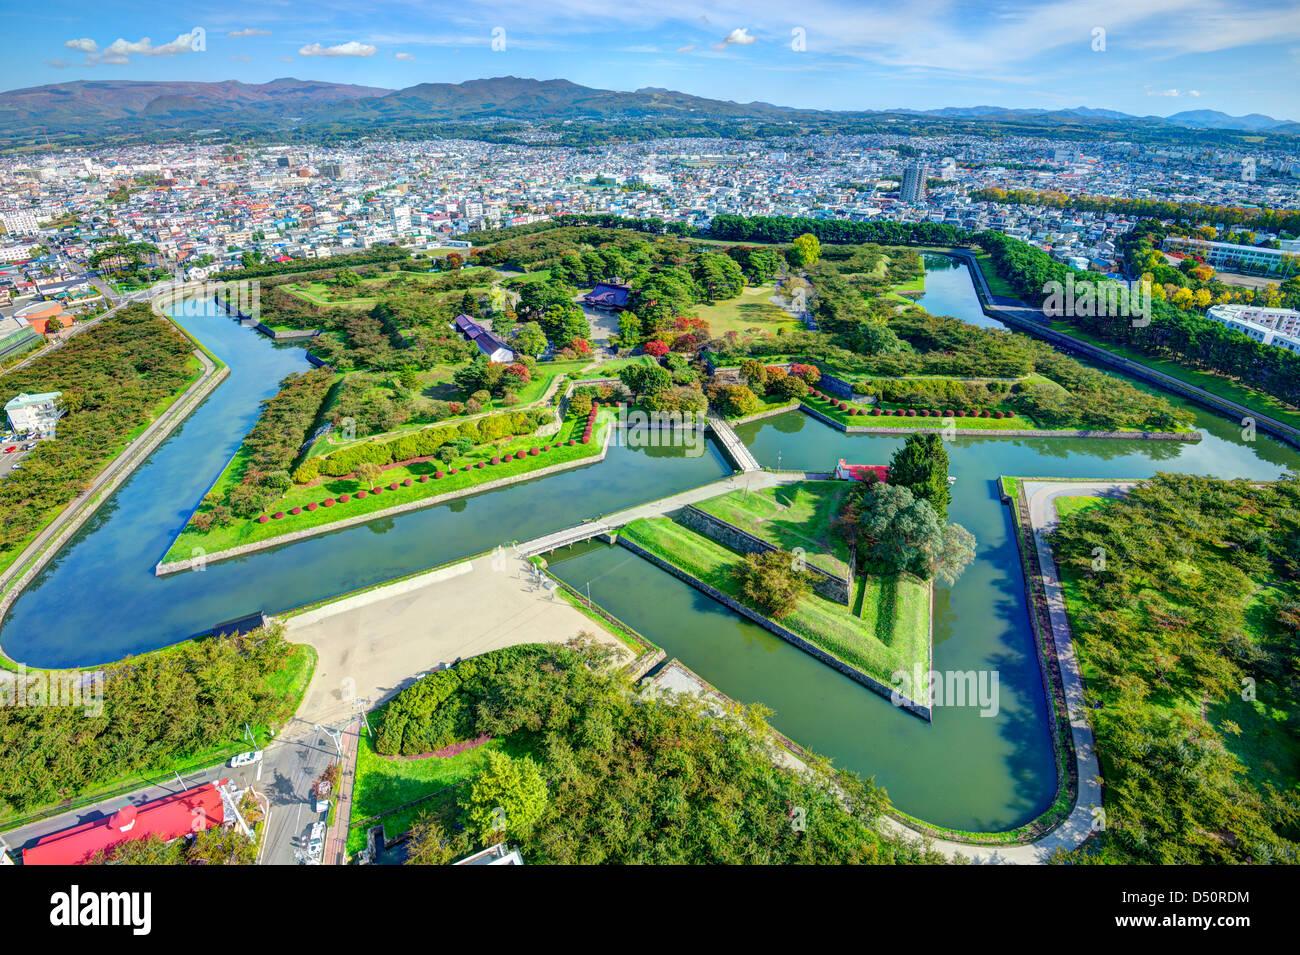 Goryokaku Park in Hakodate, Hokkaido, Japan was originally a star fort designed in 1855. - Stock Image